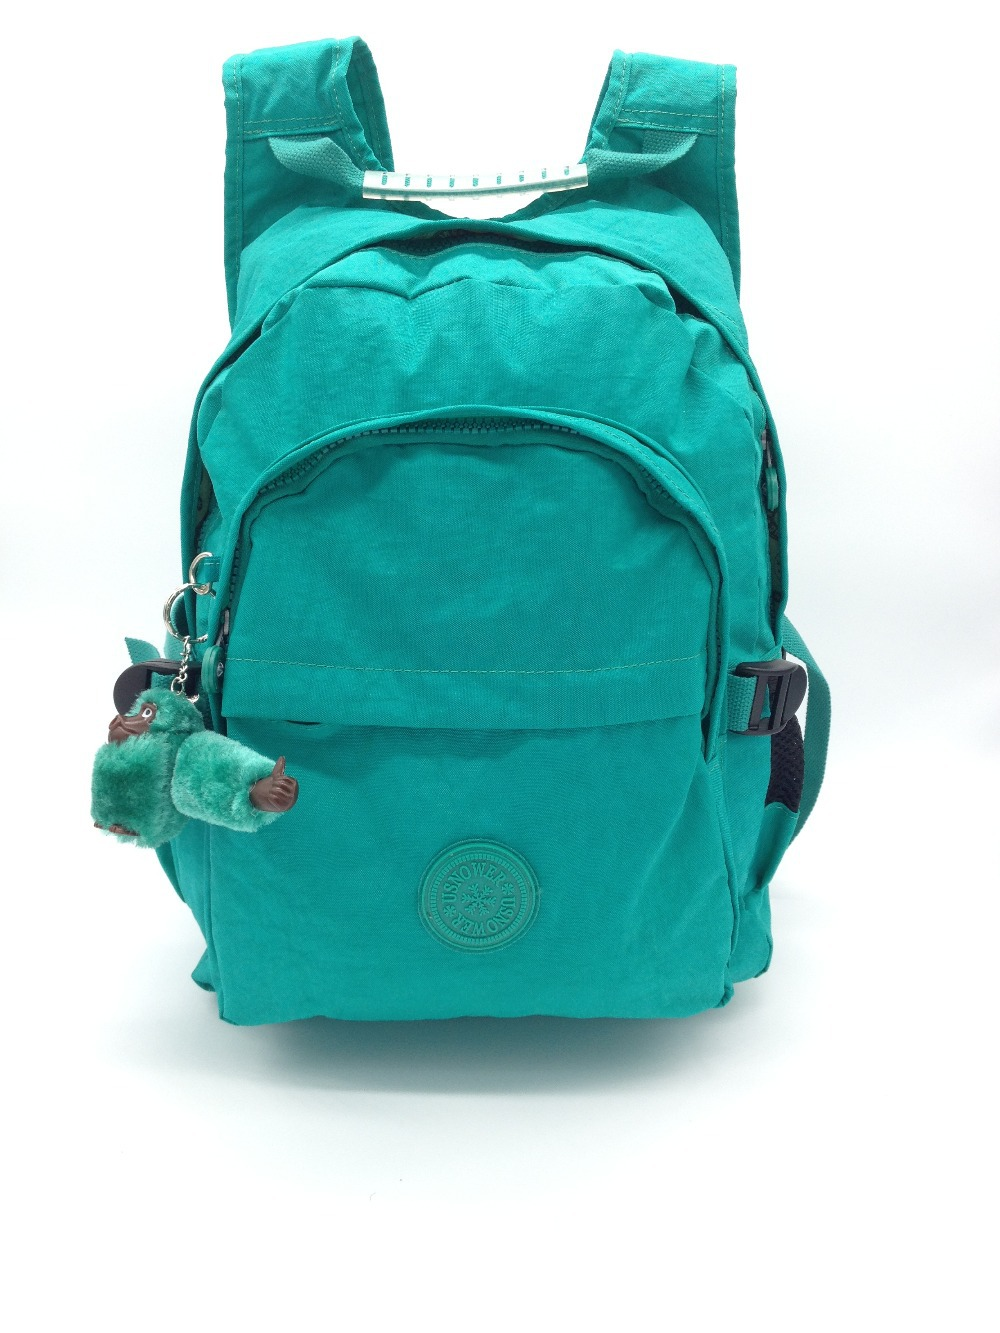 Mochila escolar kip school bag women backpack laptop bag bolsas mochila feminina 2015 travel bags